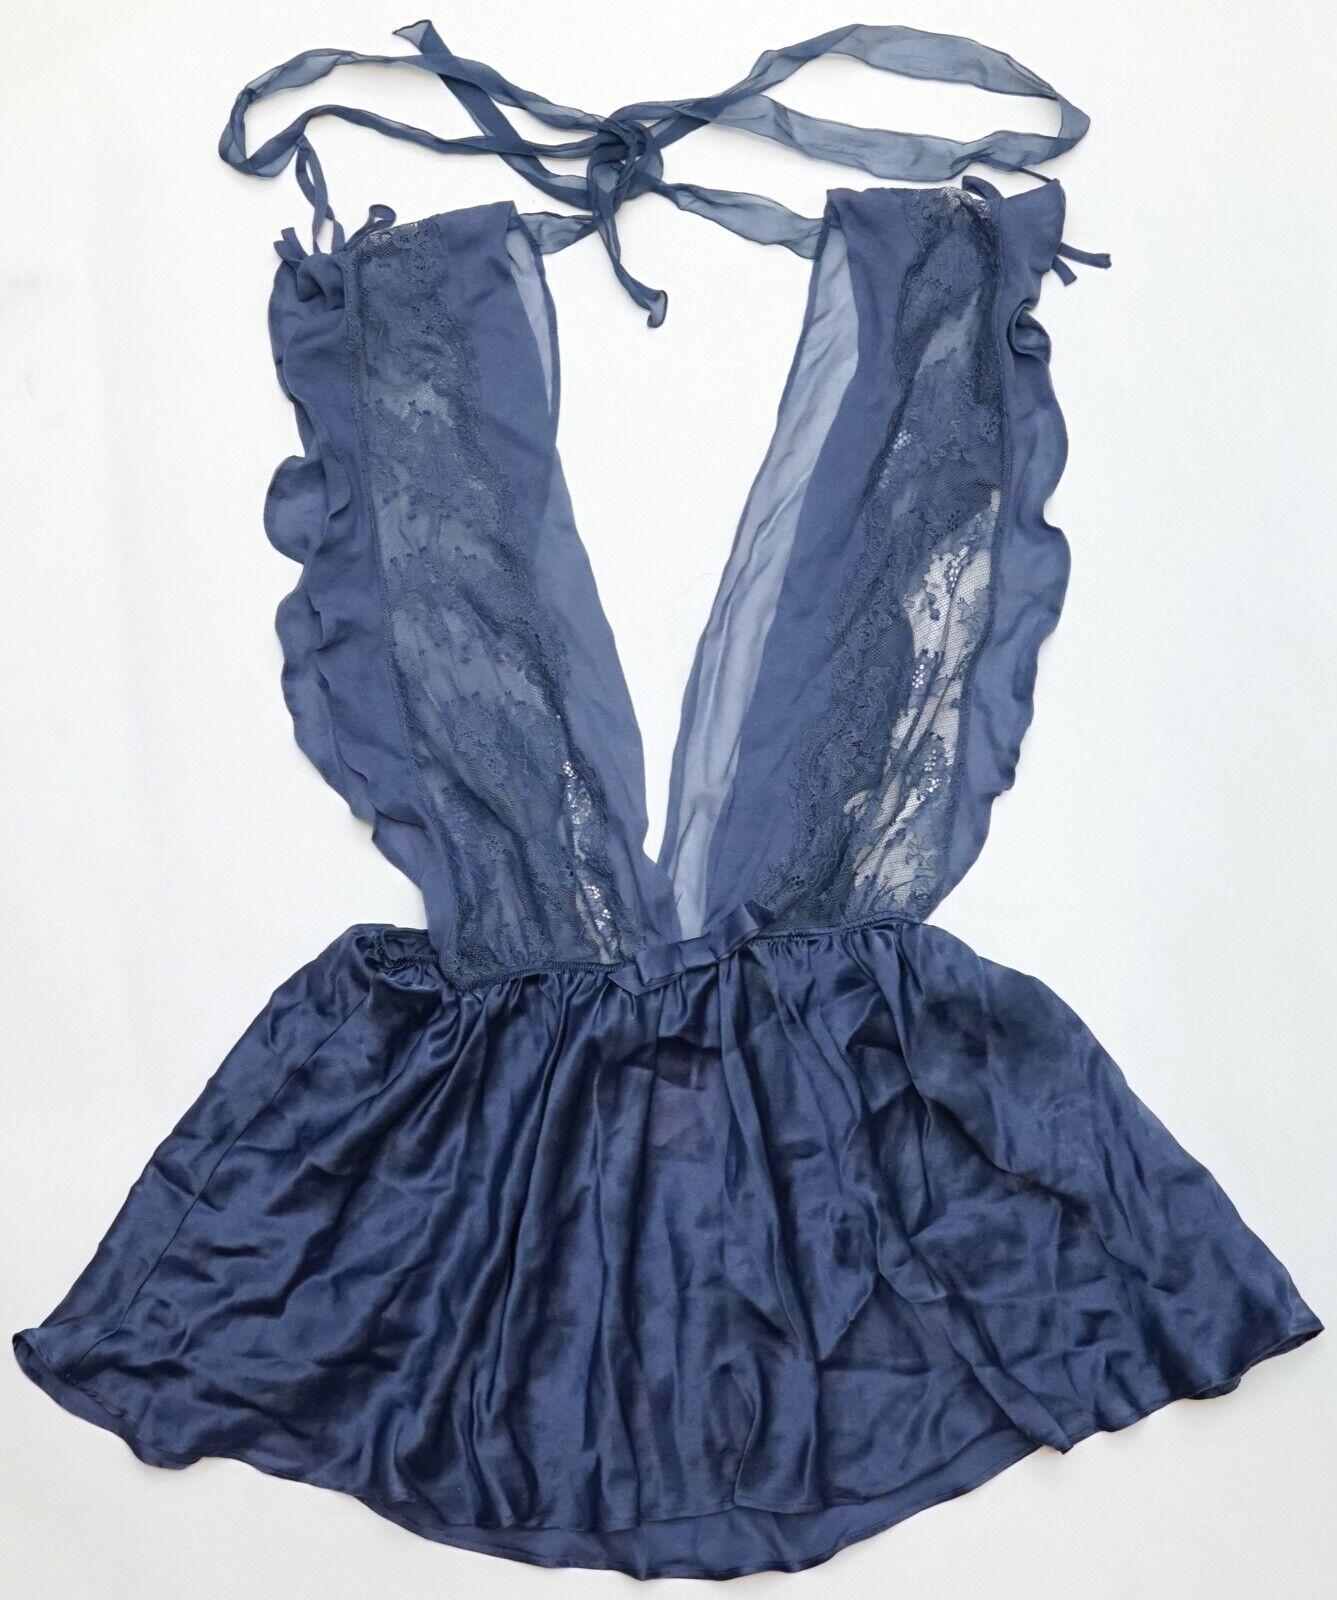 New Victoria's Secret Designer Collection bluee Silk Lace Teddy Lingerie Dress S